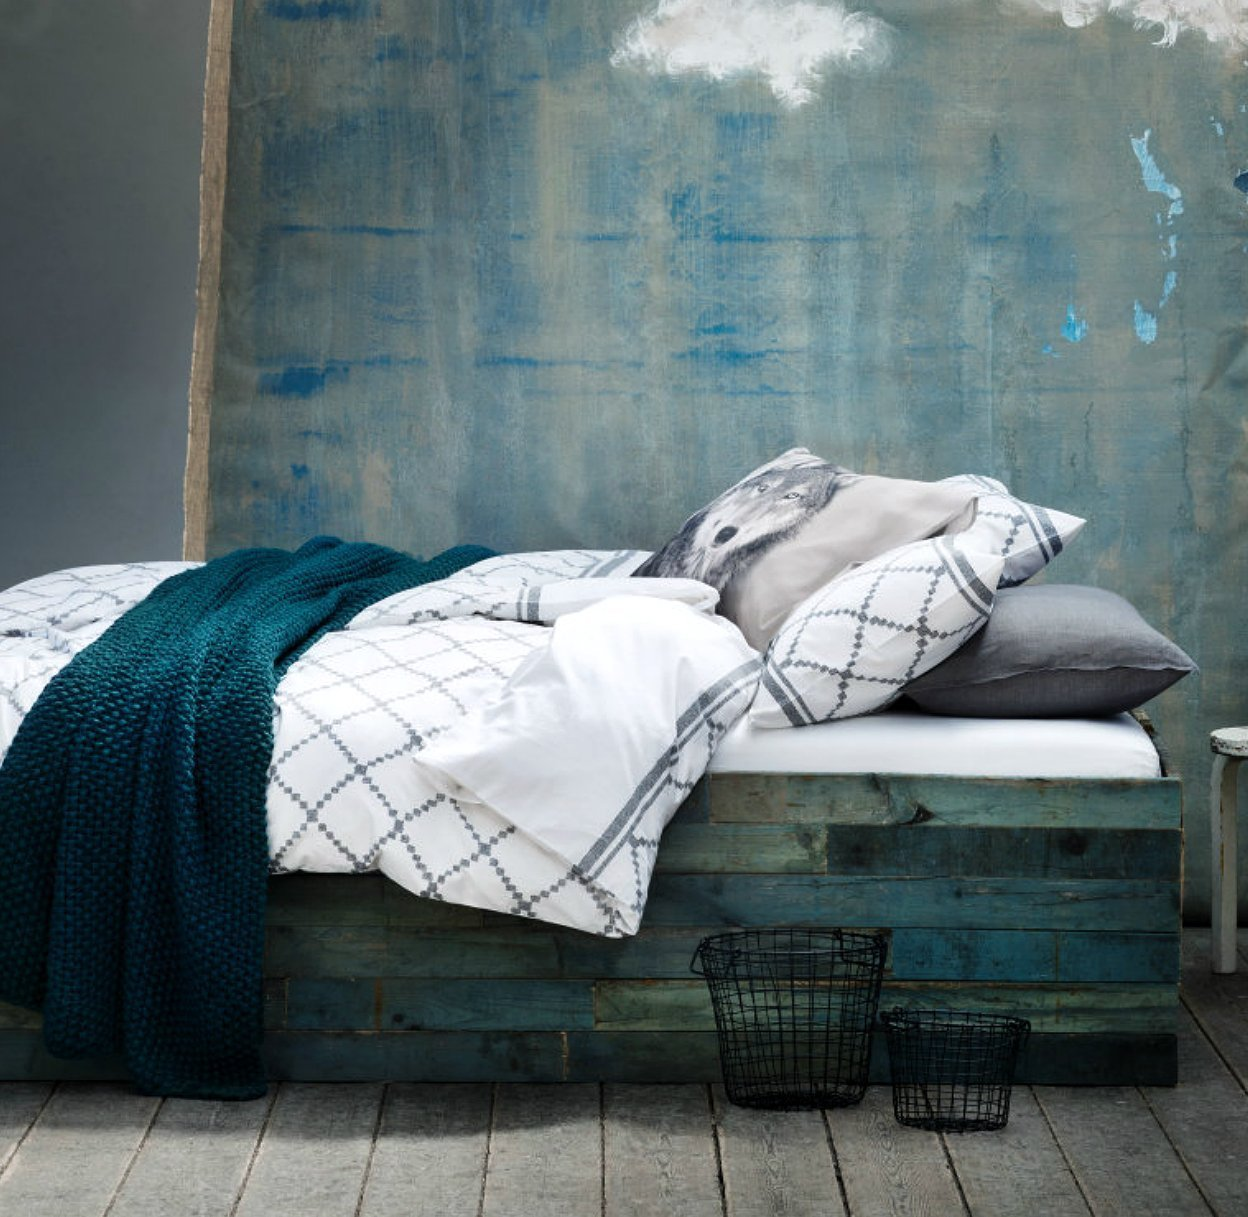 Mid century modern bedding charcoal grey geometric print duvet cover 100 cotton 2 piece set